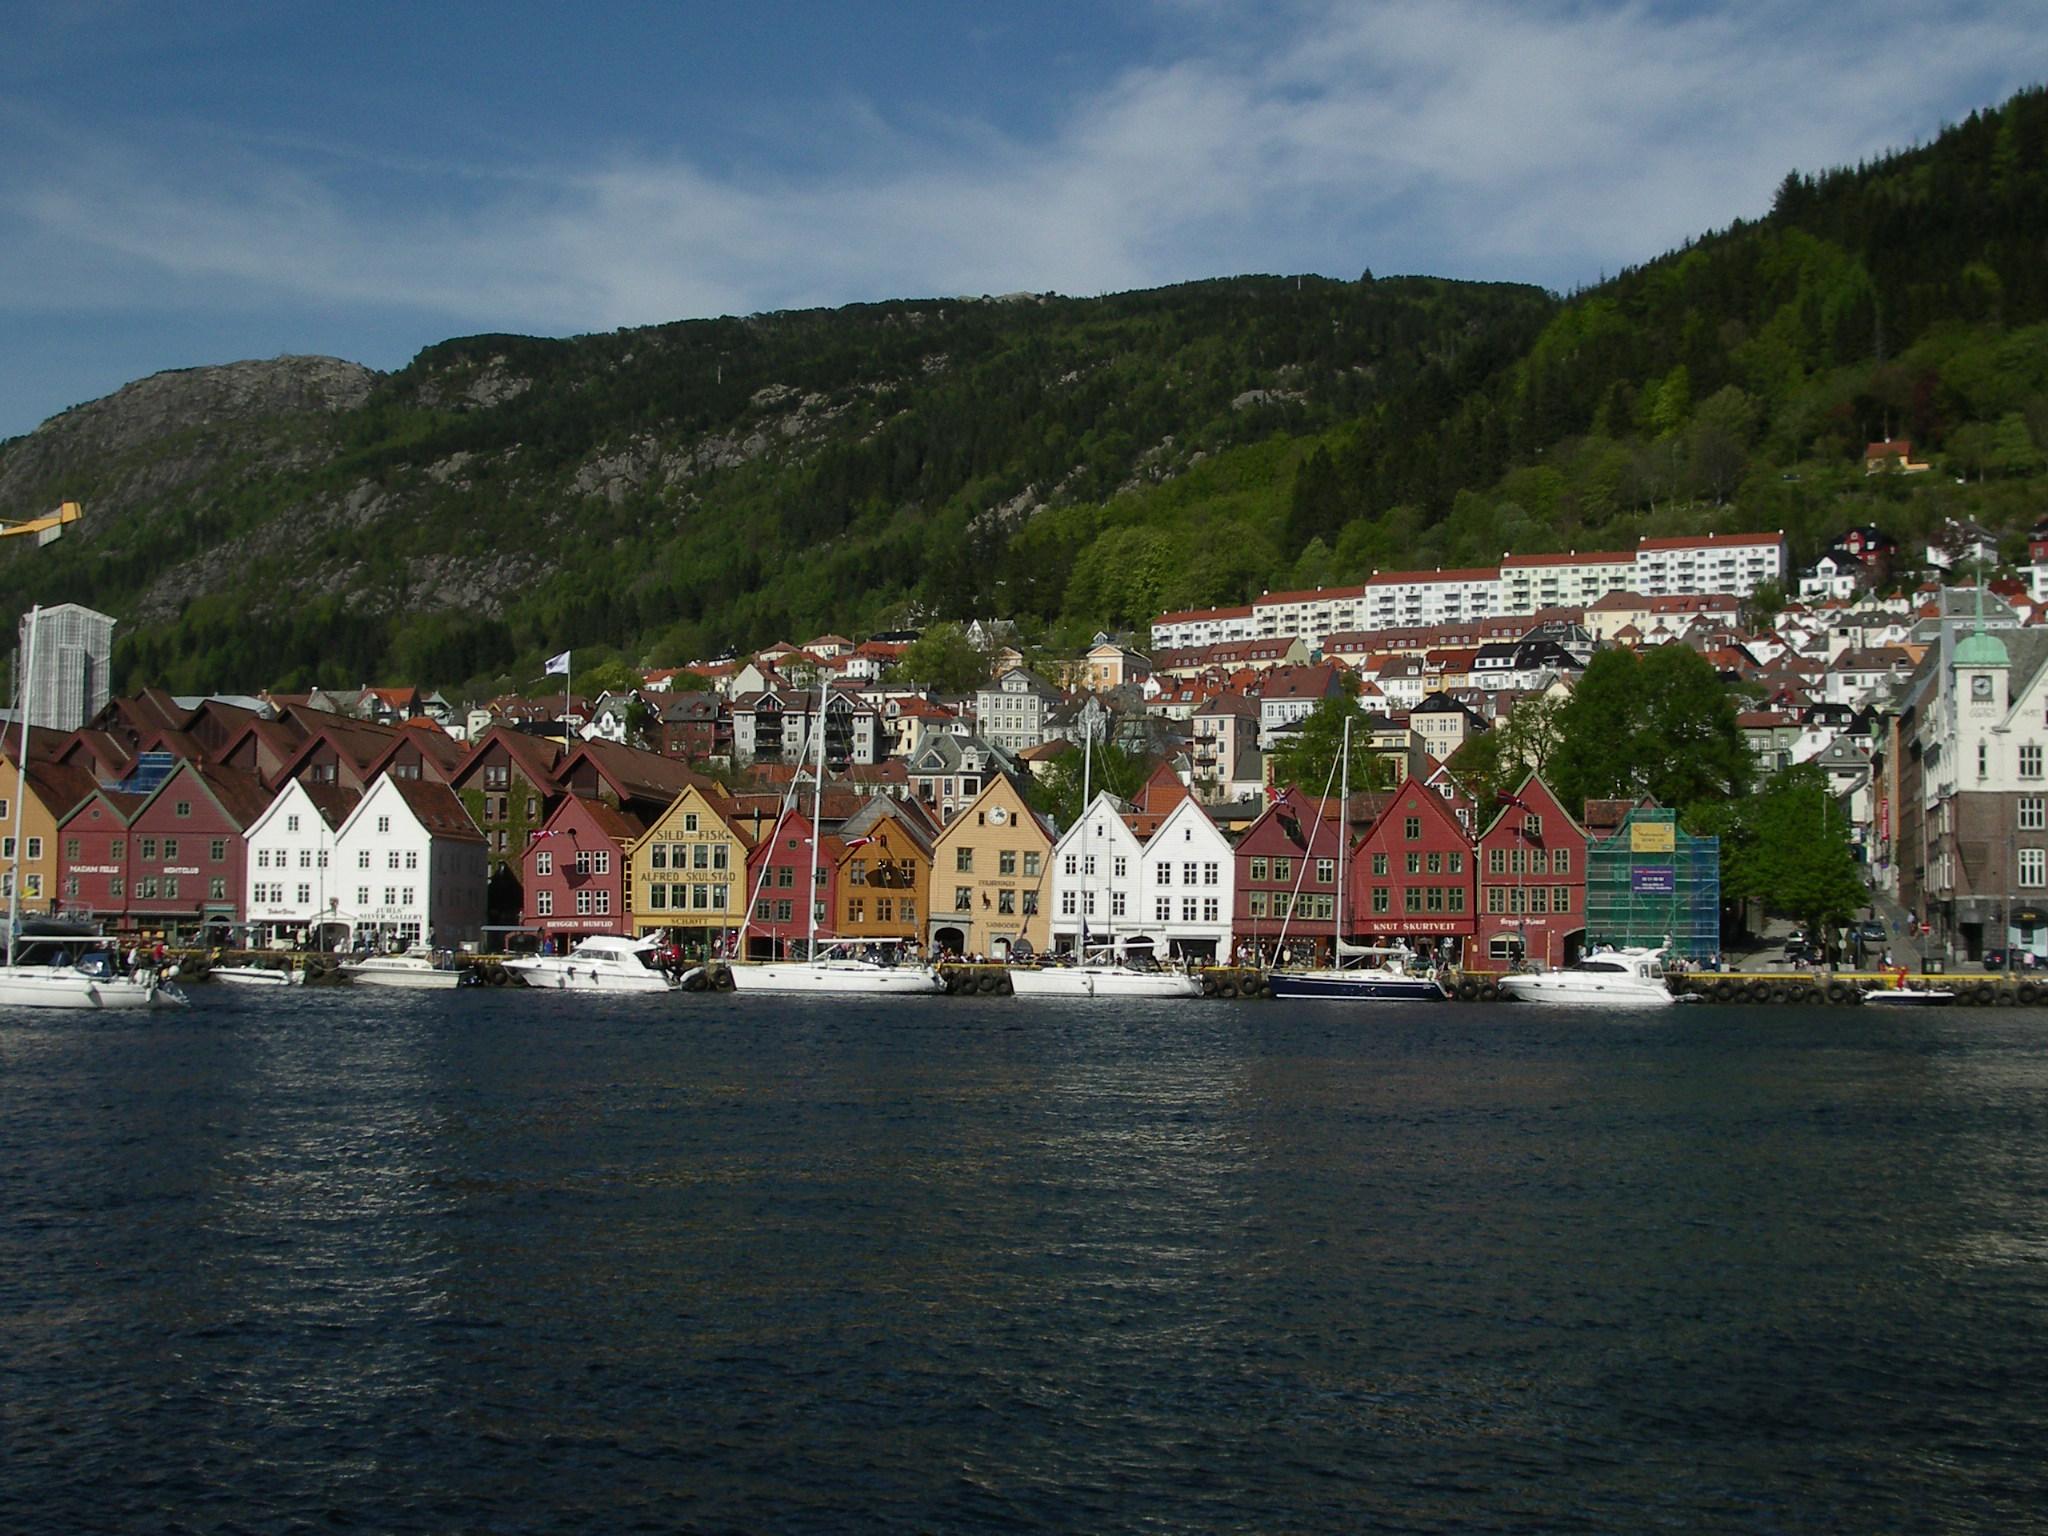 Bergen zweitgrößte Stadt Norwegens